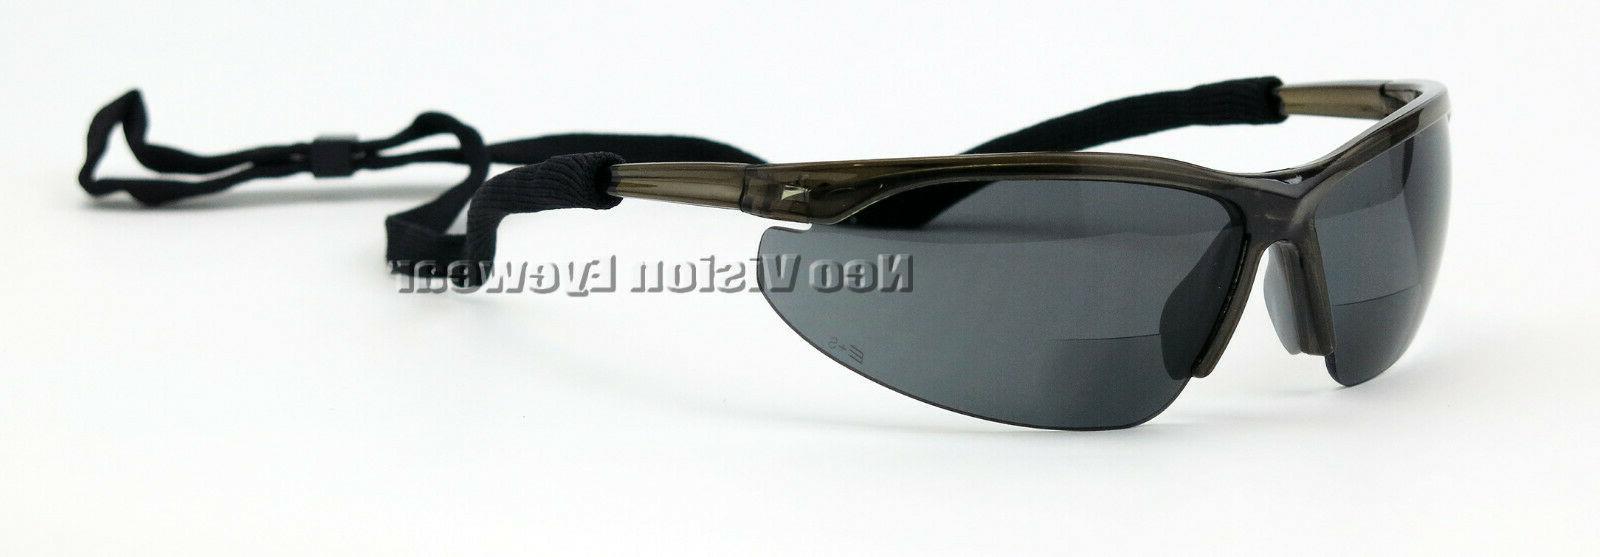 ERB Pinpoint Bifocal Safety Glasses Smoke Magnifier Reading